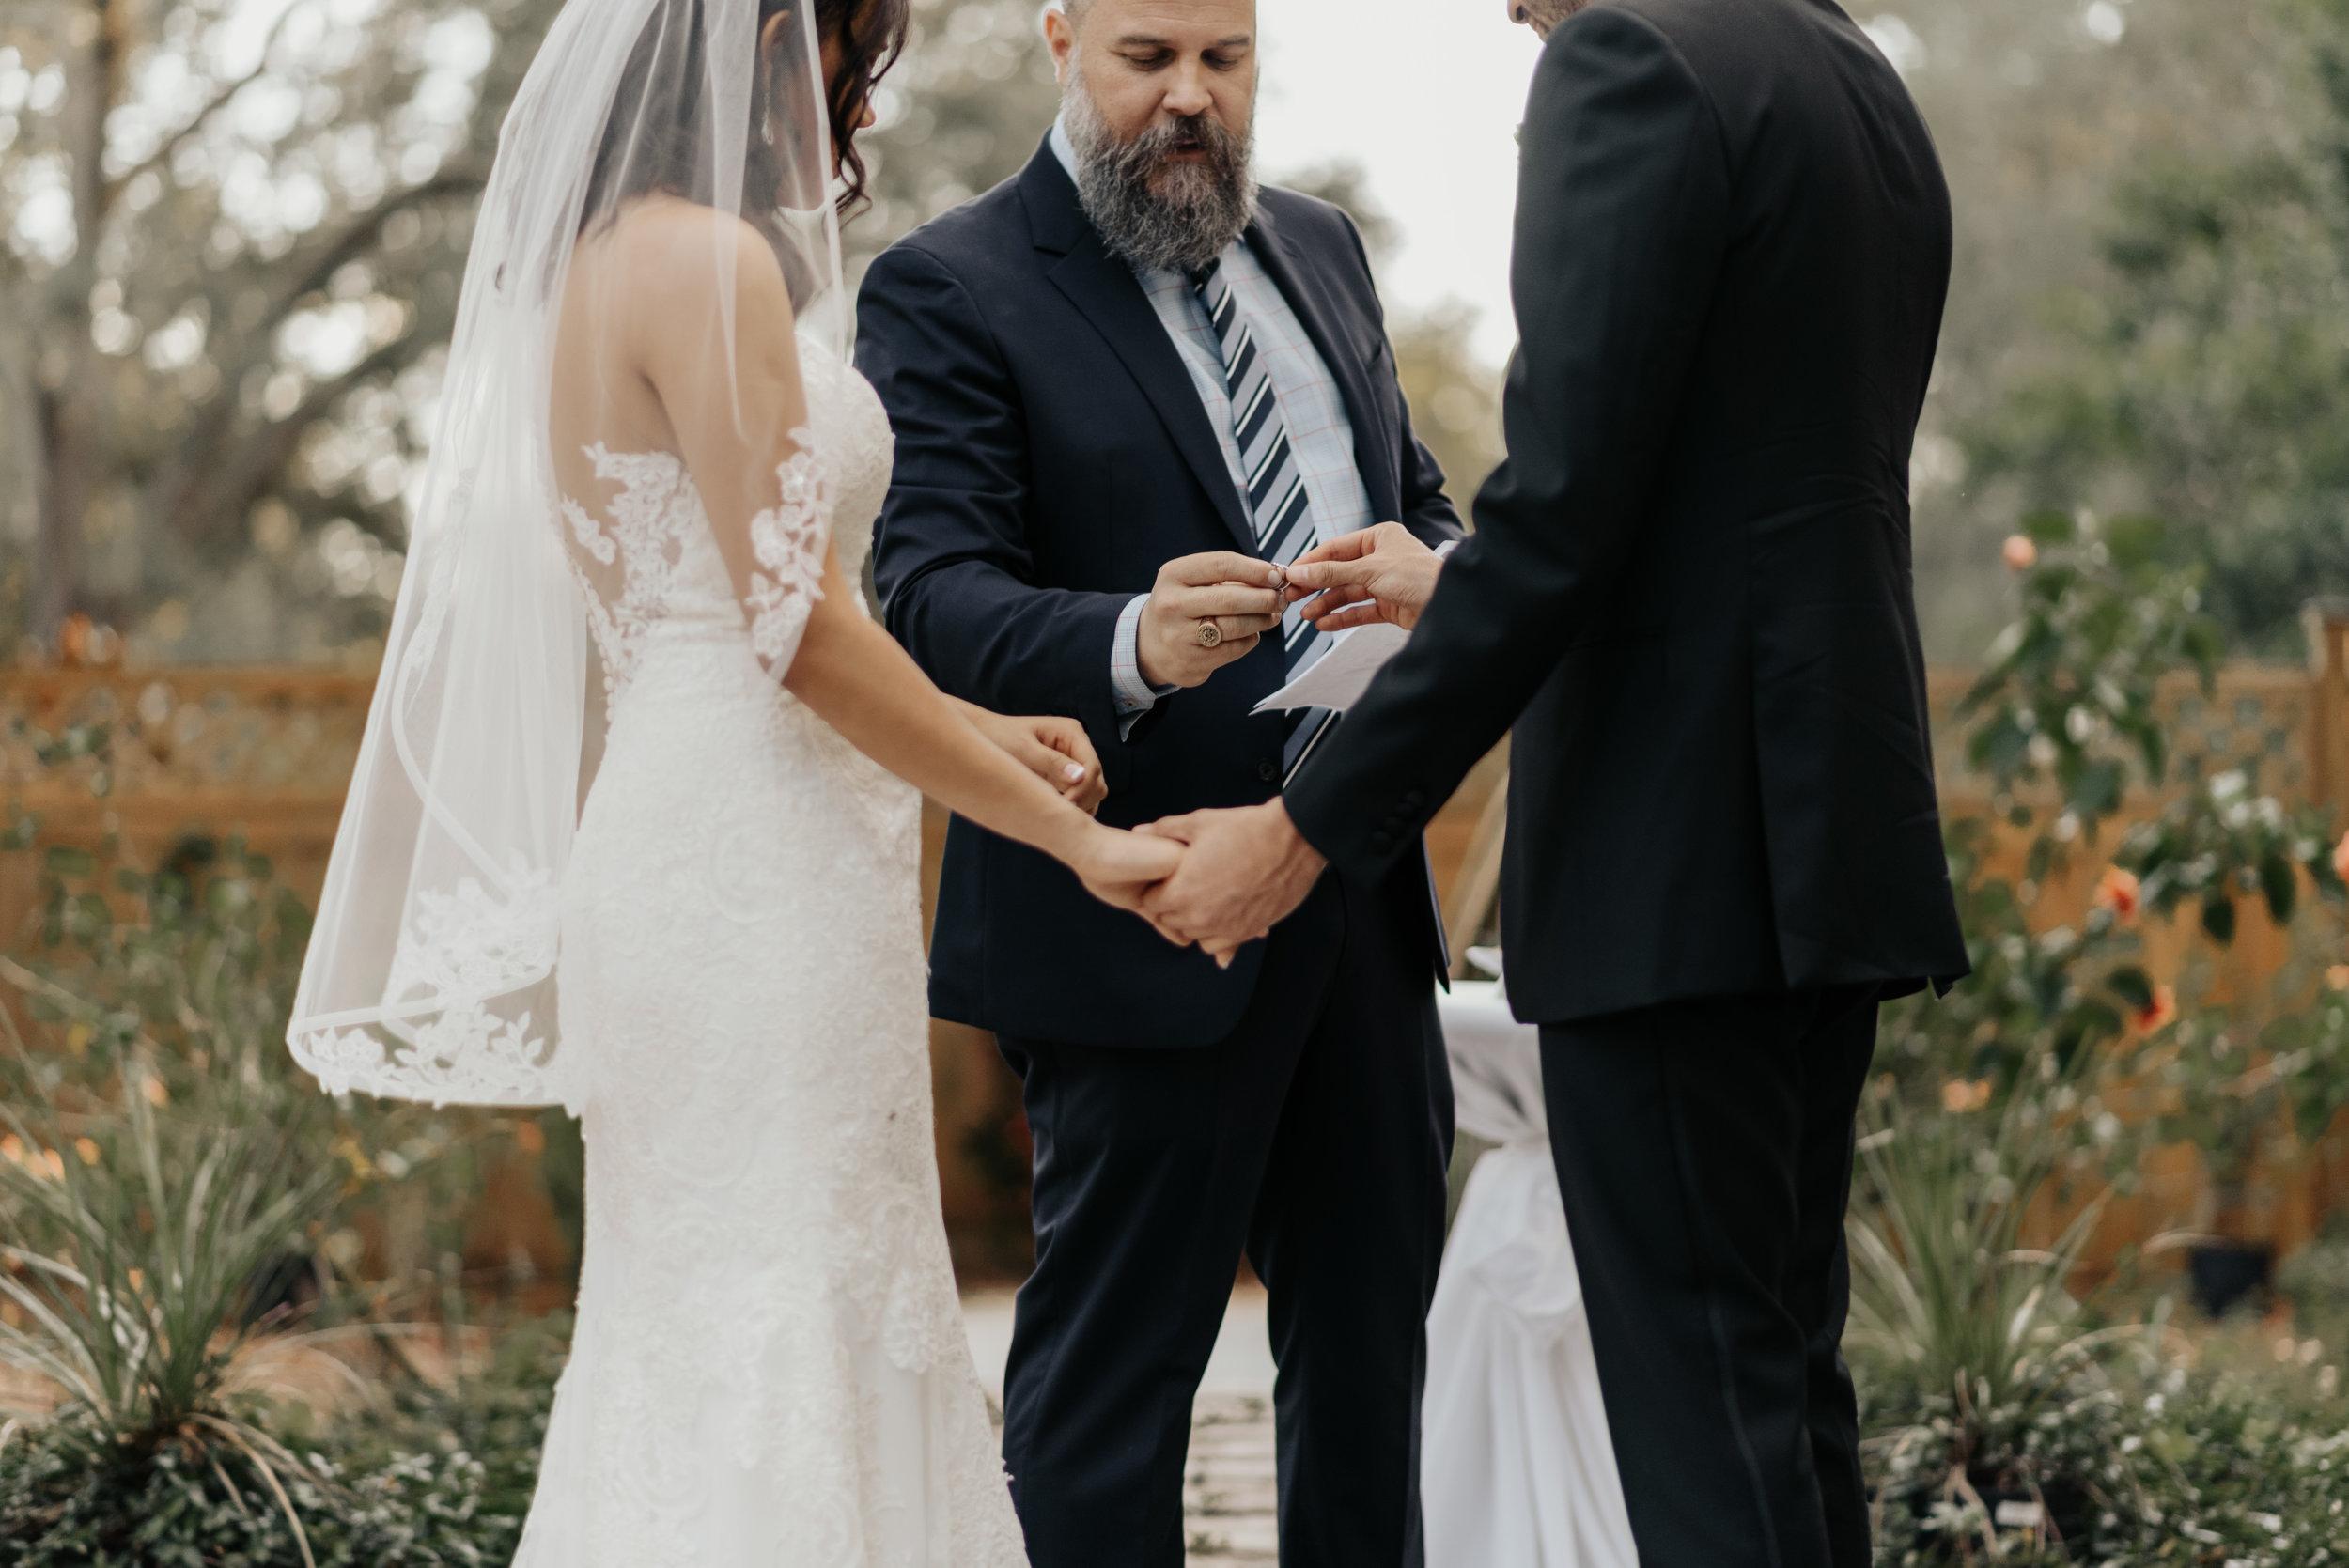 Kirstie-AJ-Wedding-0060.jpg